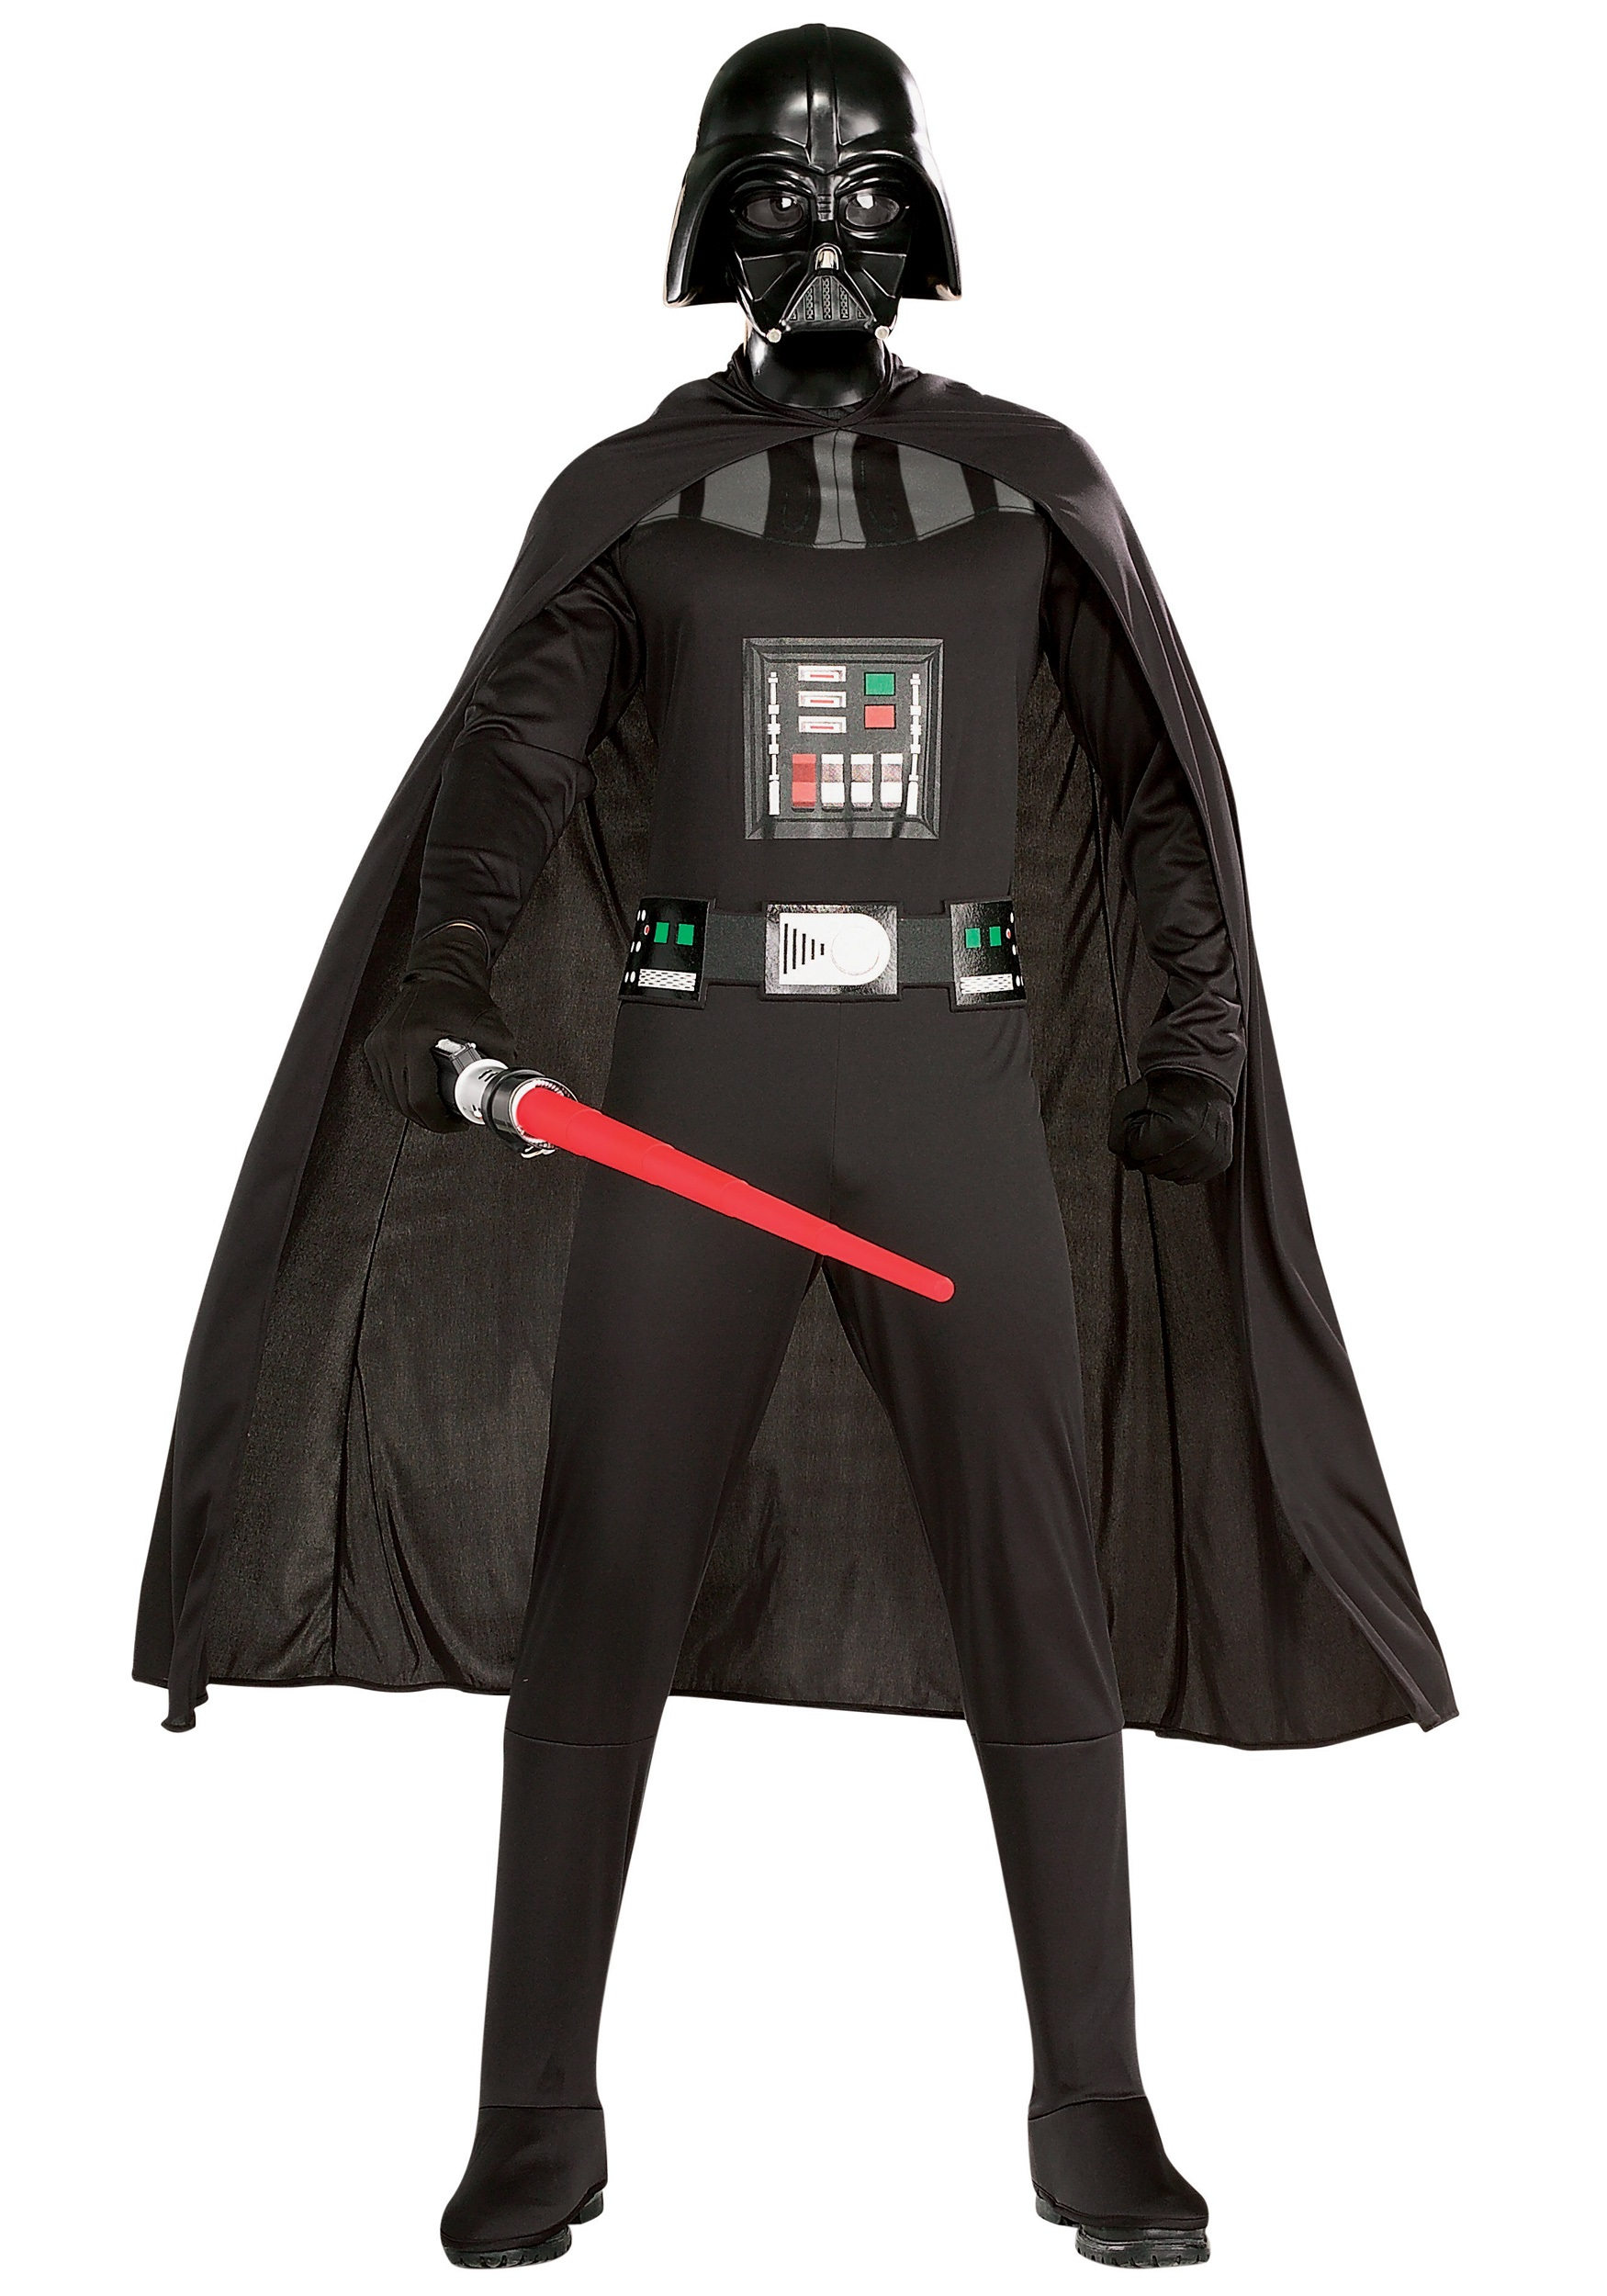 fbdab9bf8 Standard Darth Vader Costume